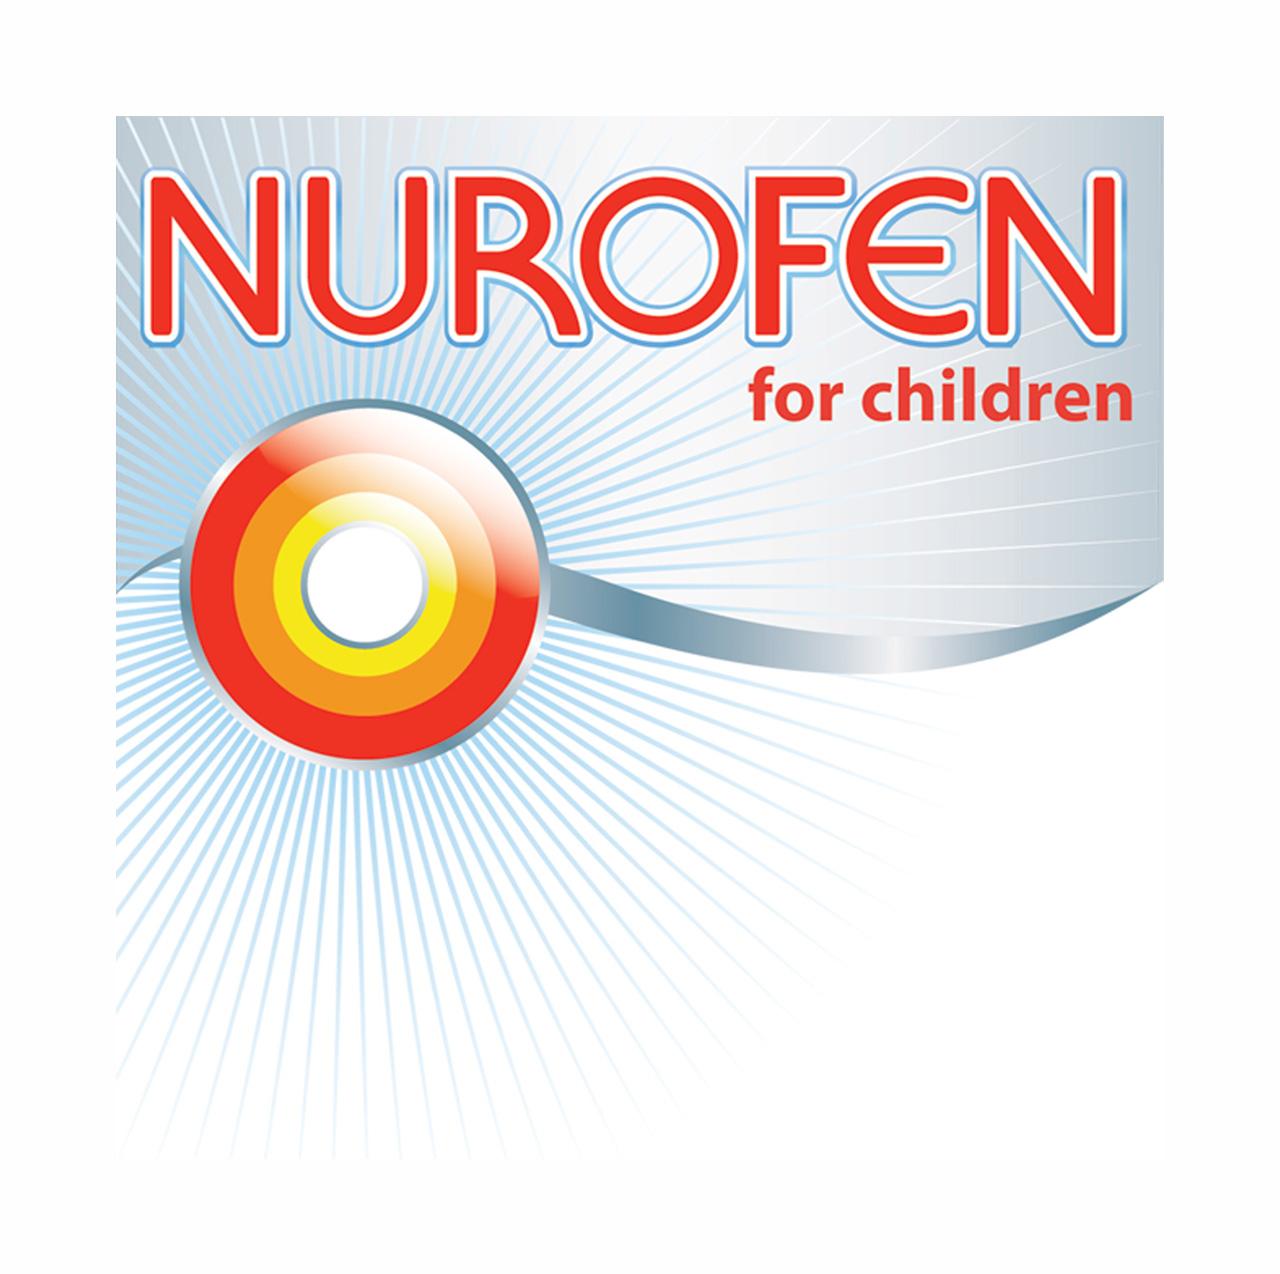 NUROFEN-(FOR-KIDS)-LOGO